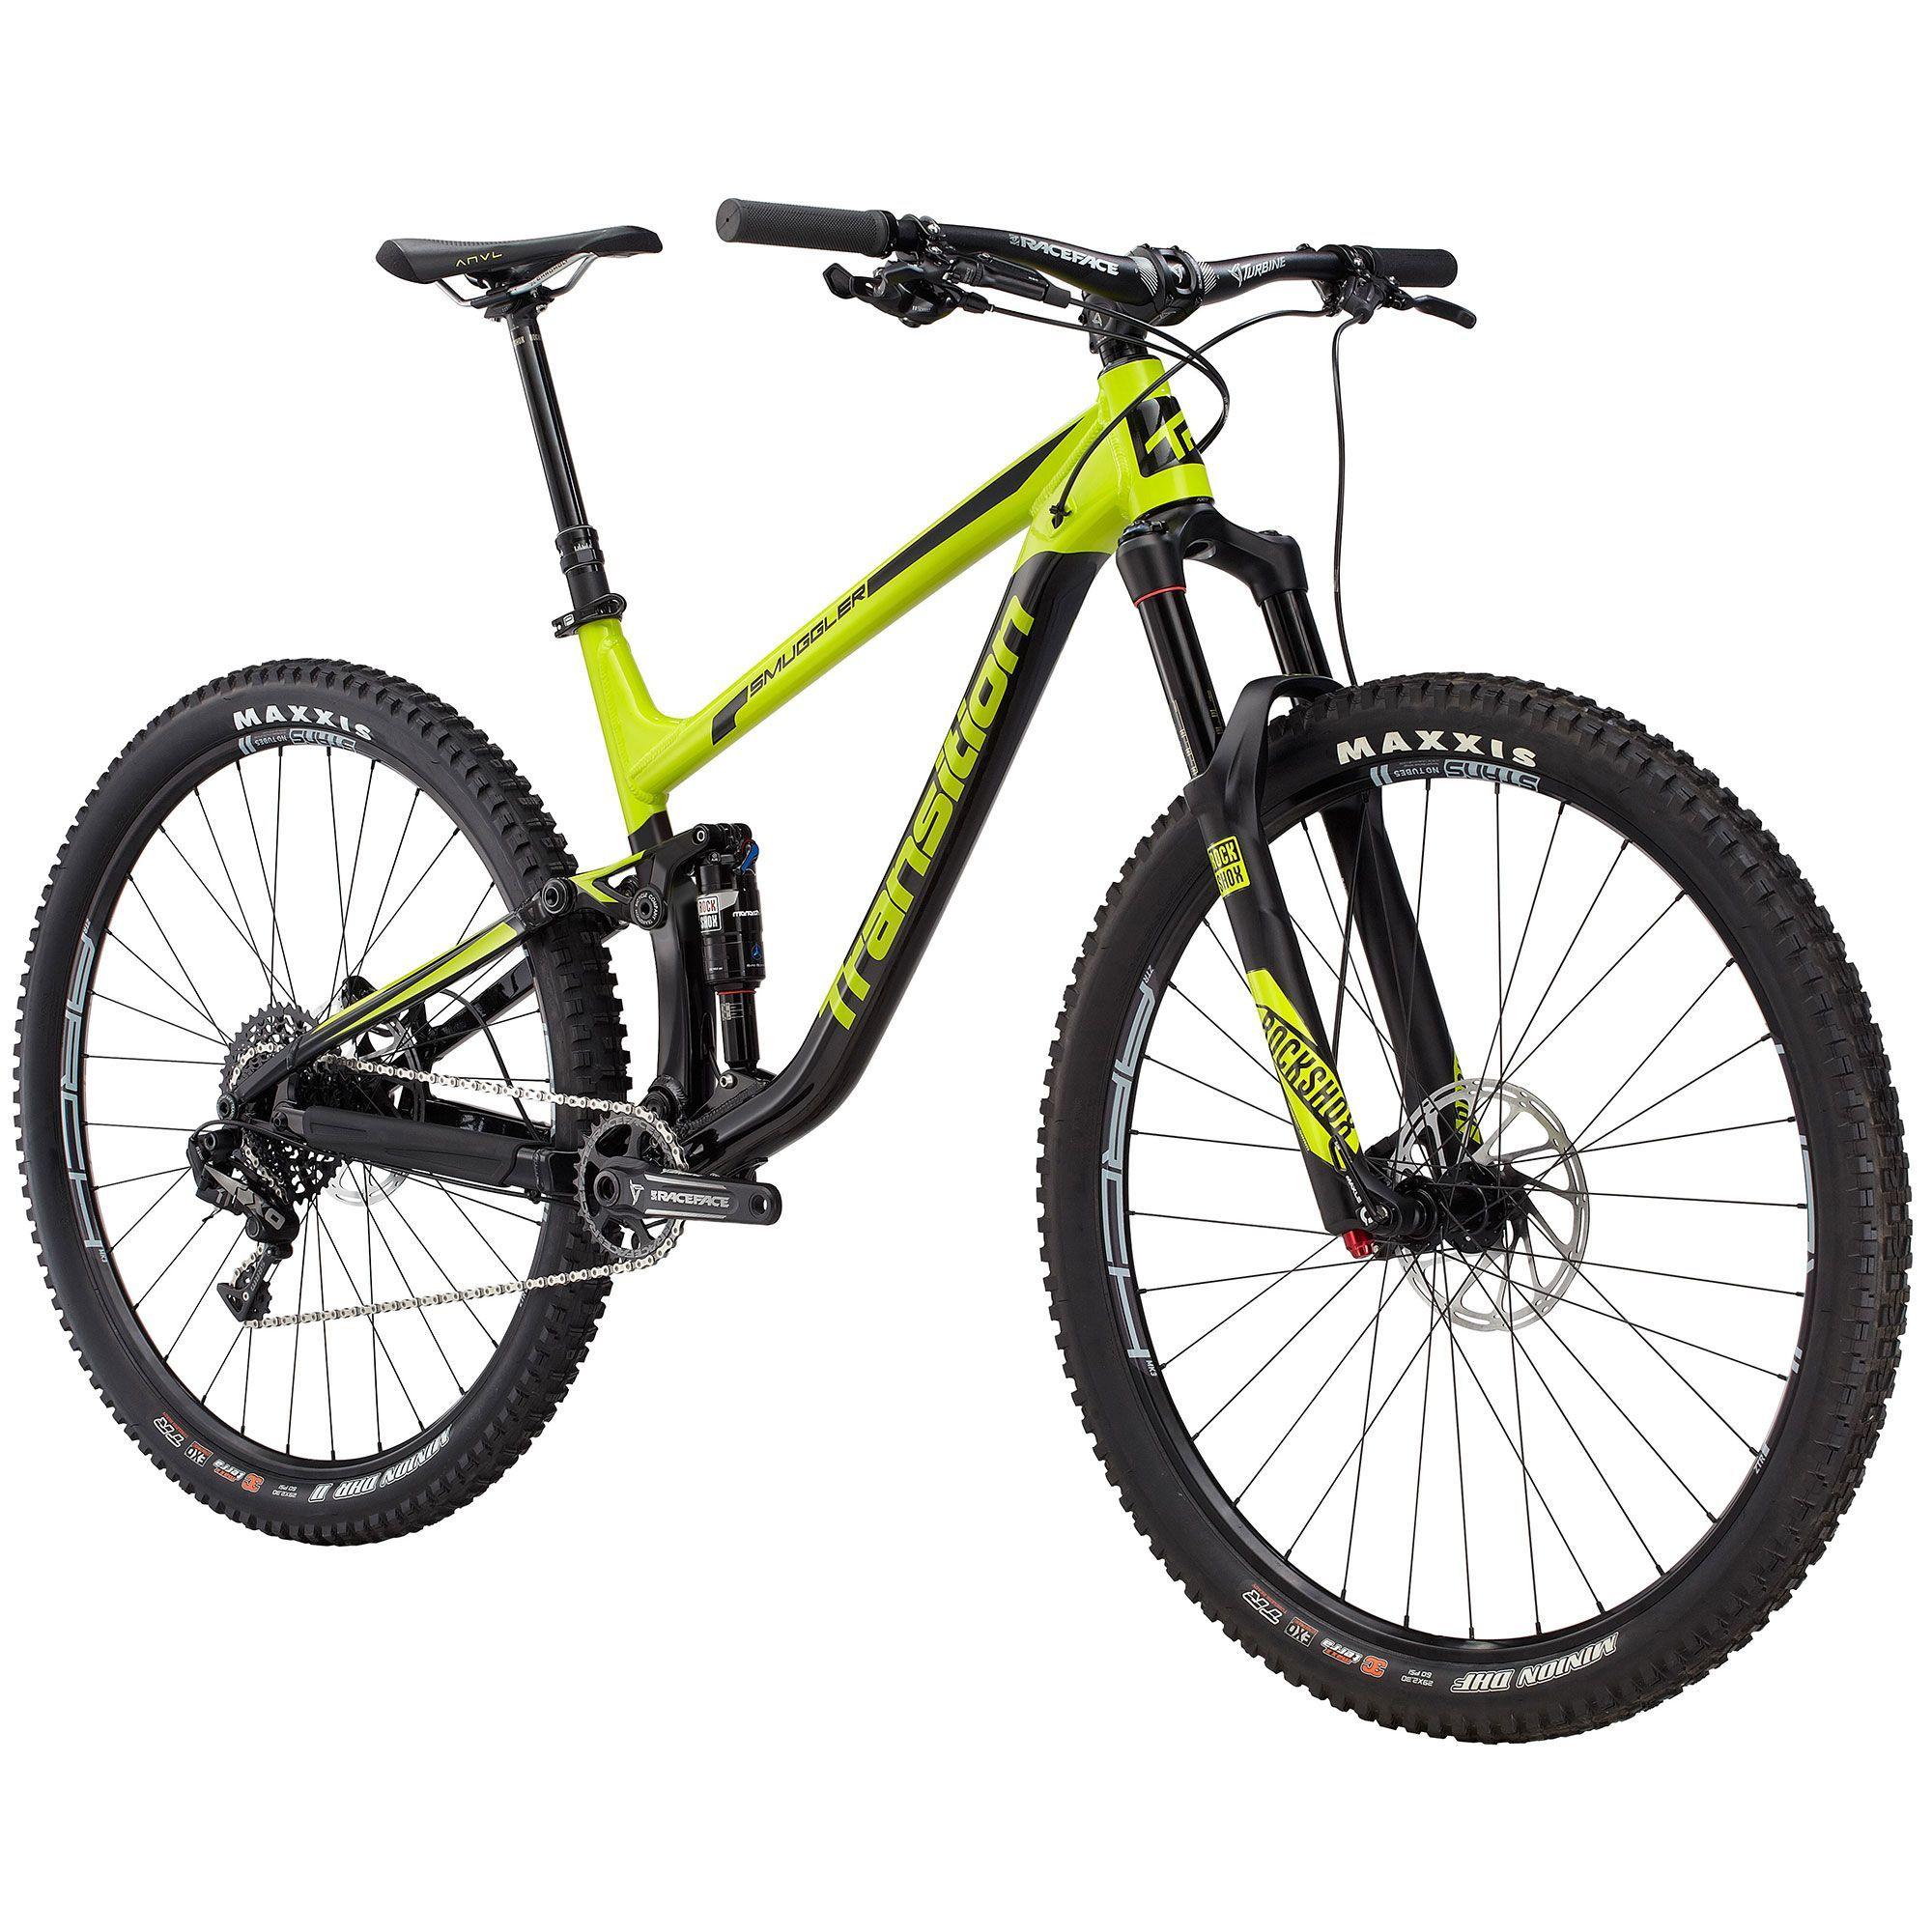 Transition Smuggler 4 Full Suspension Mountain Bike 29 Inch